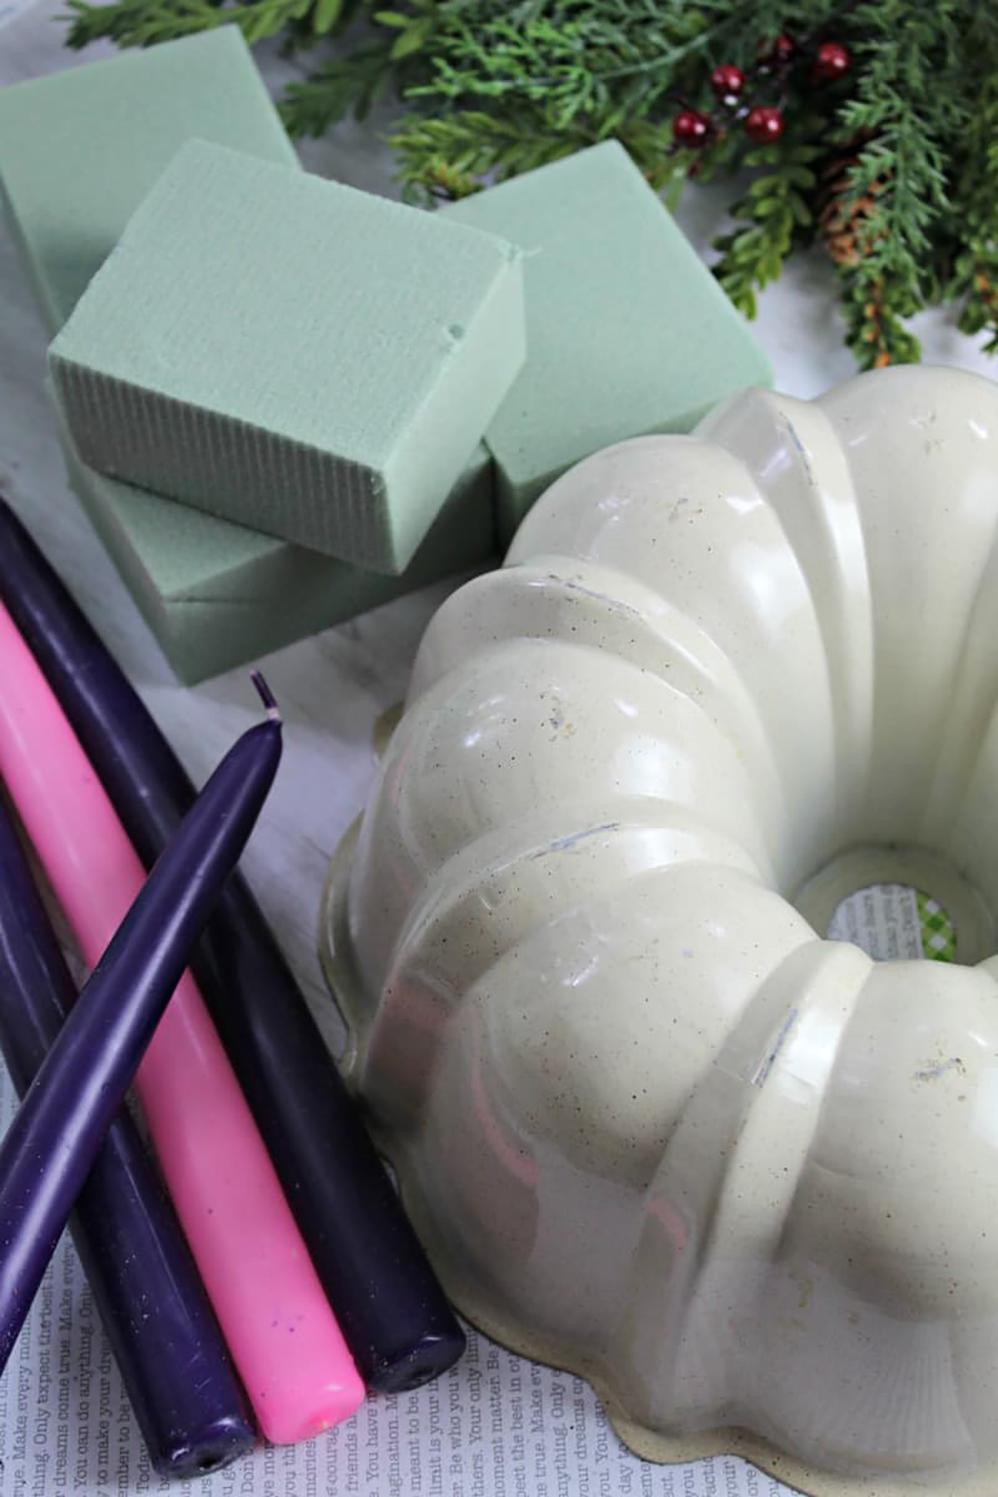 easy-advent-wreath-craft-materials.jpg